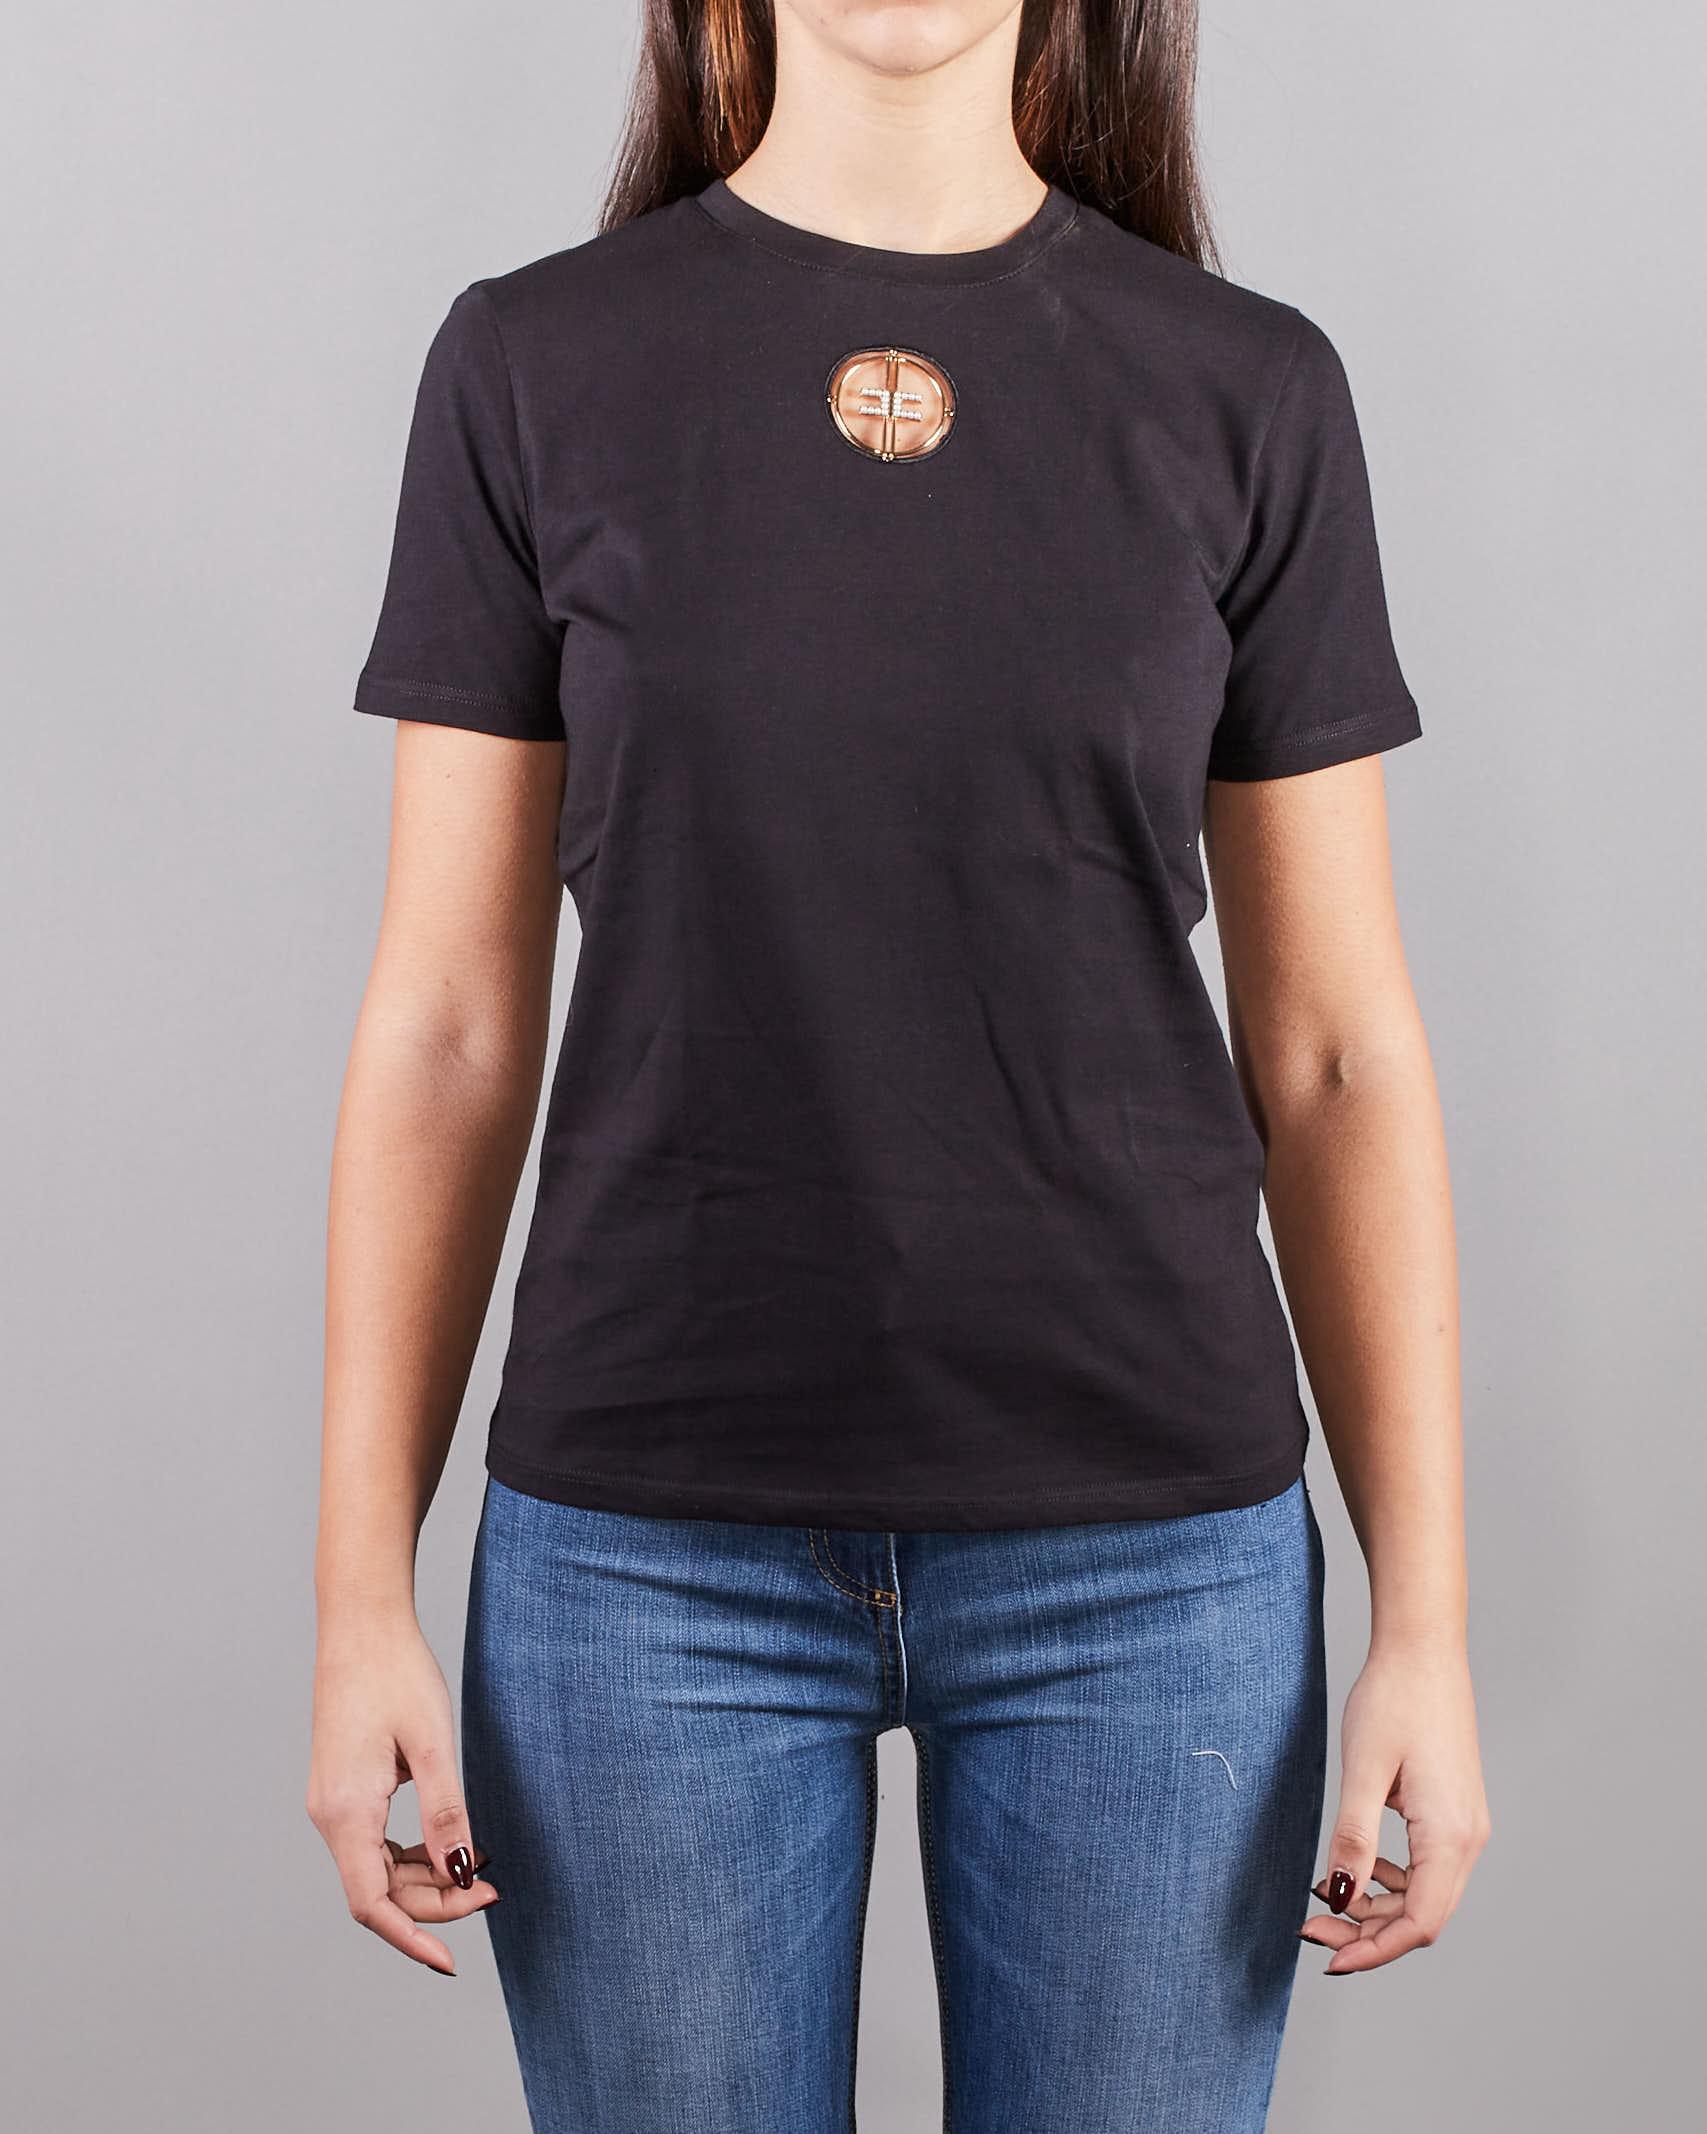 T-shirt con logo in strass ricamato Elisabetta Franchi ELISABETTA FRANCHI   T-shirt   MA25N11E2110